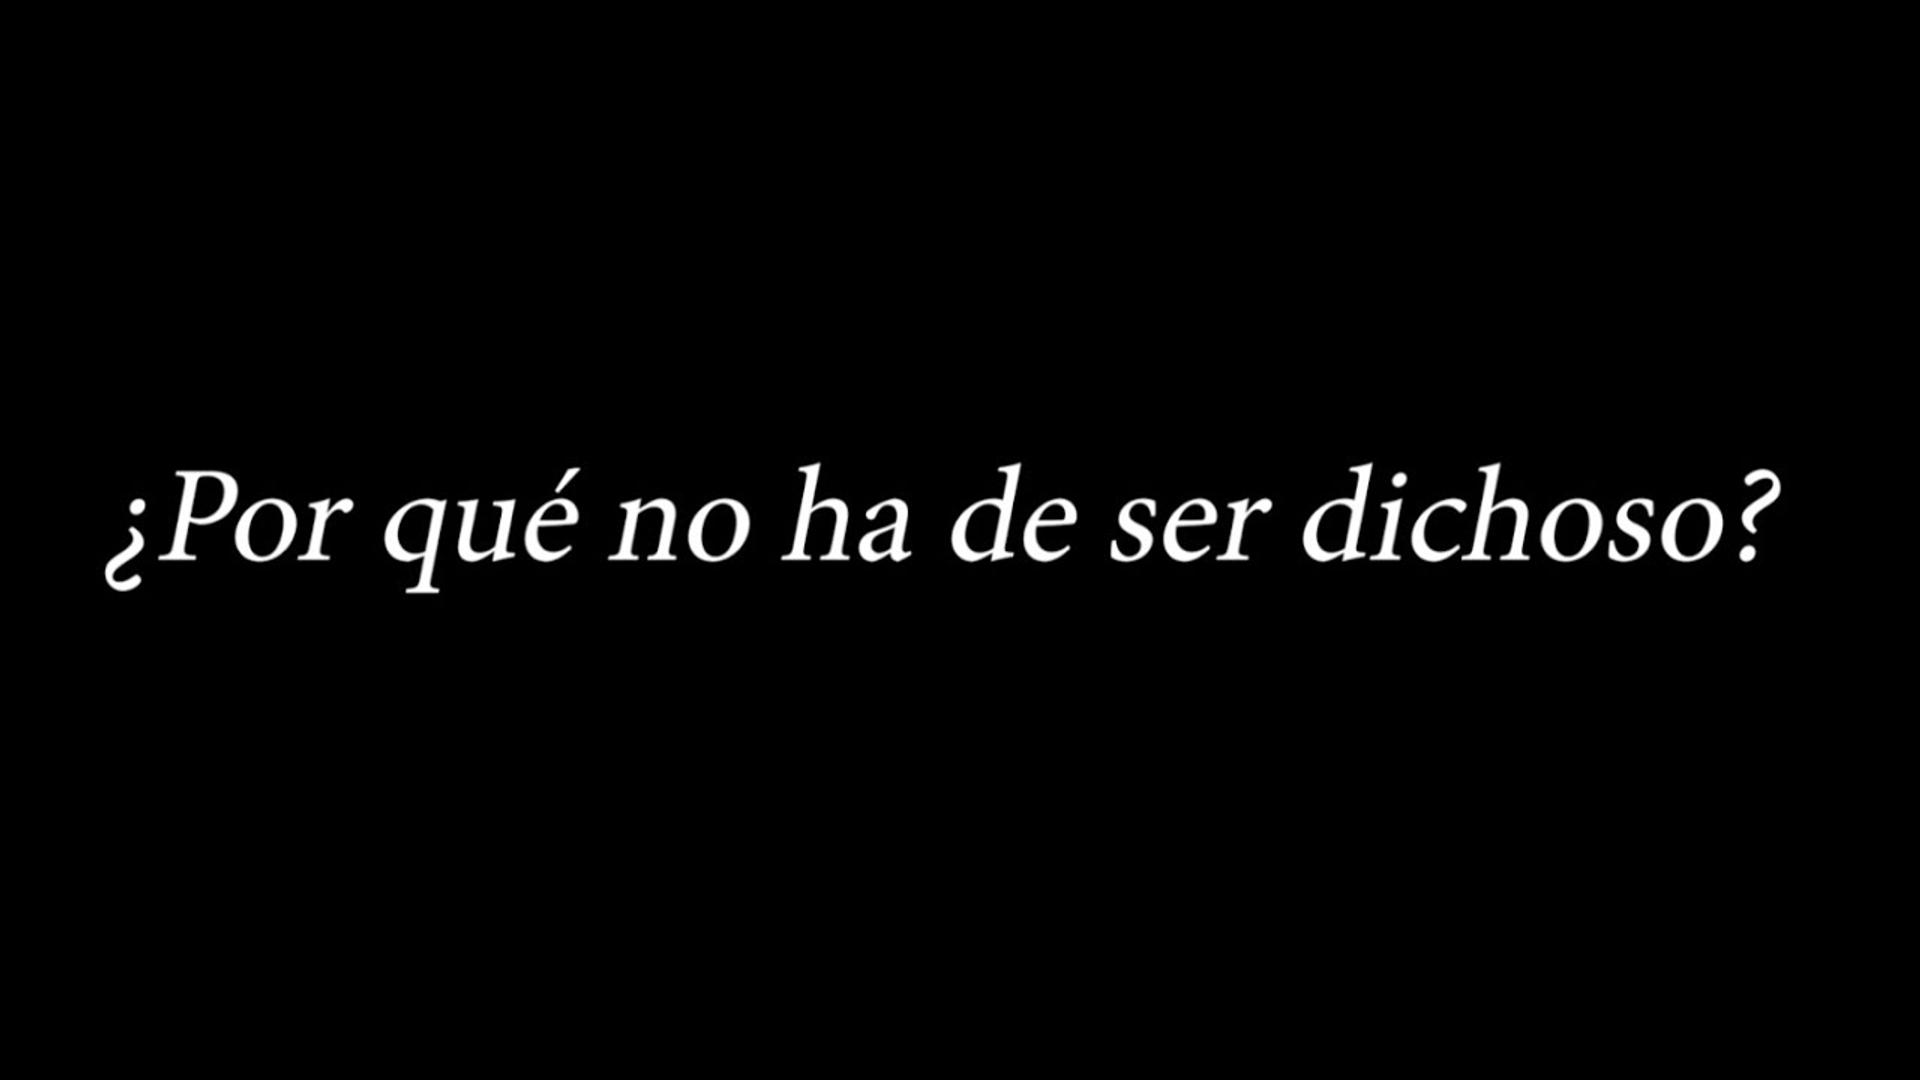 """¿Por qué no ha de ser dichoso?"" de Giacomo Facco. Betty Fabila, soprano-Uberto Zanolli (OCENP-UNAM)"